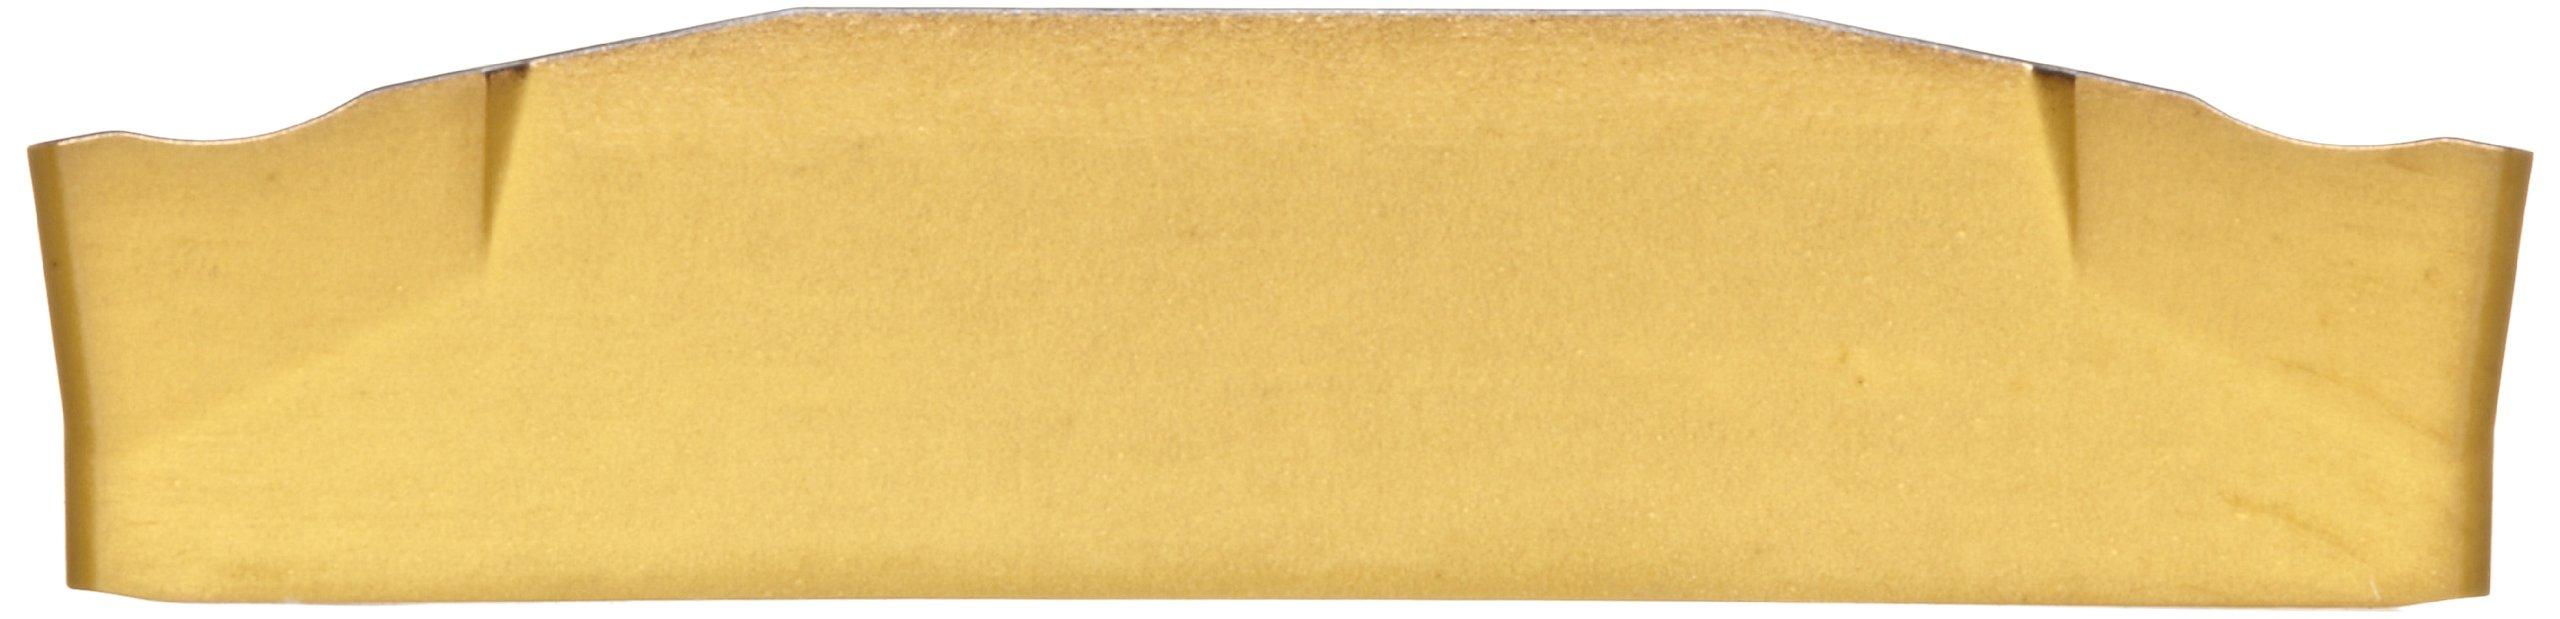 Sandvik Coromant CoroCut 2-Edge Carbide Parting Insert, GC2135 Grade, Multi-Layer Coating, CR Chipbreaker, 2 Cutting Edges, N123H2-0400-0003-CR, 0.0118'' Corner Radius, H Insert Seat Size (Pack of 10) by Sandvik Coromant (Image #2)